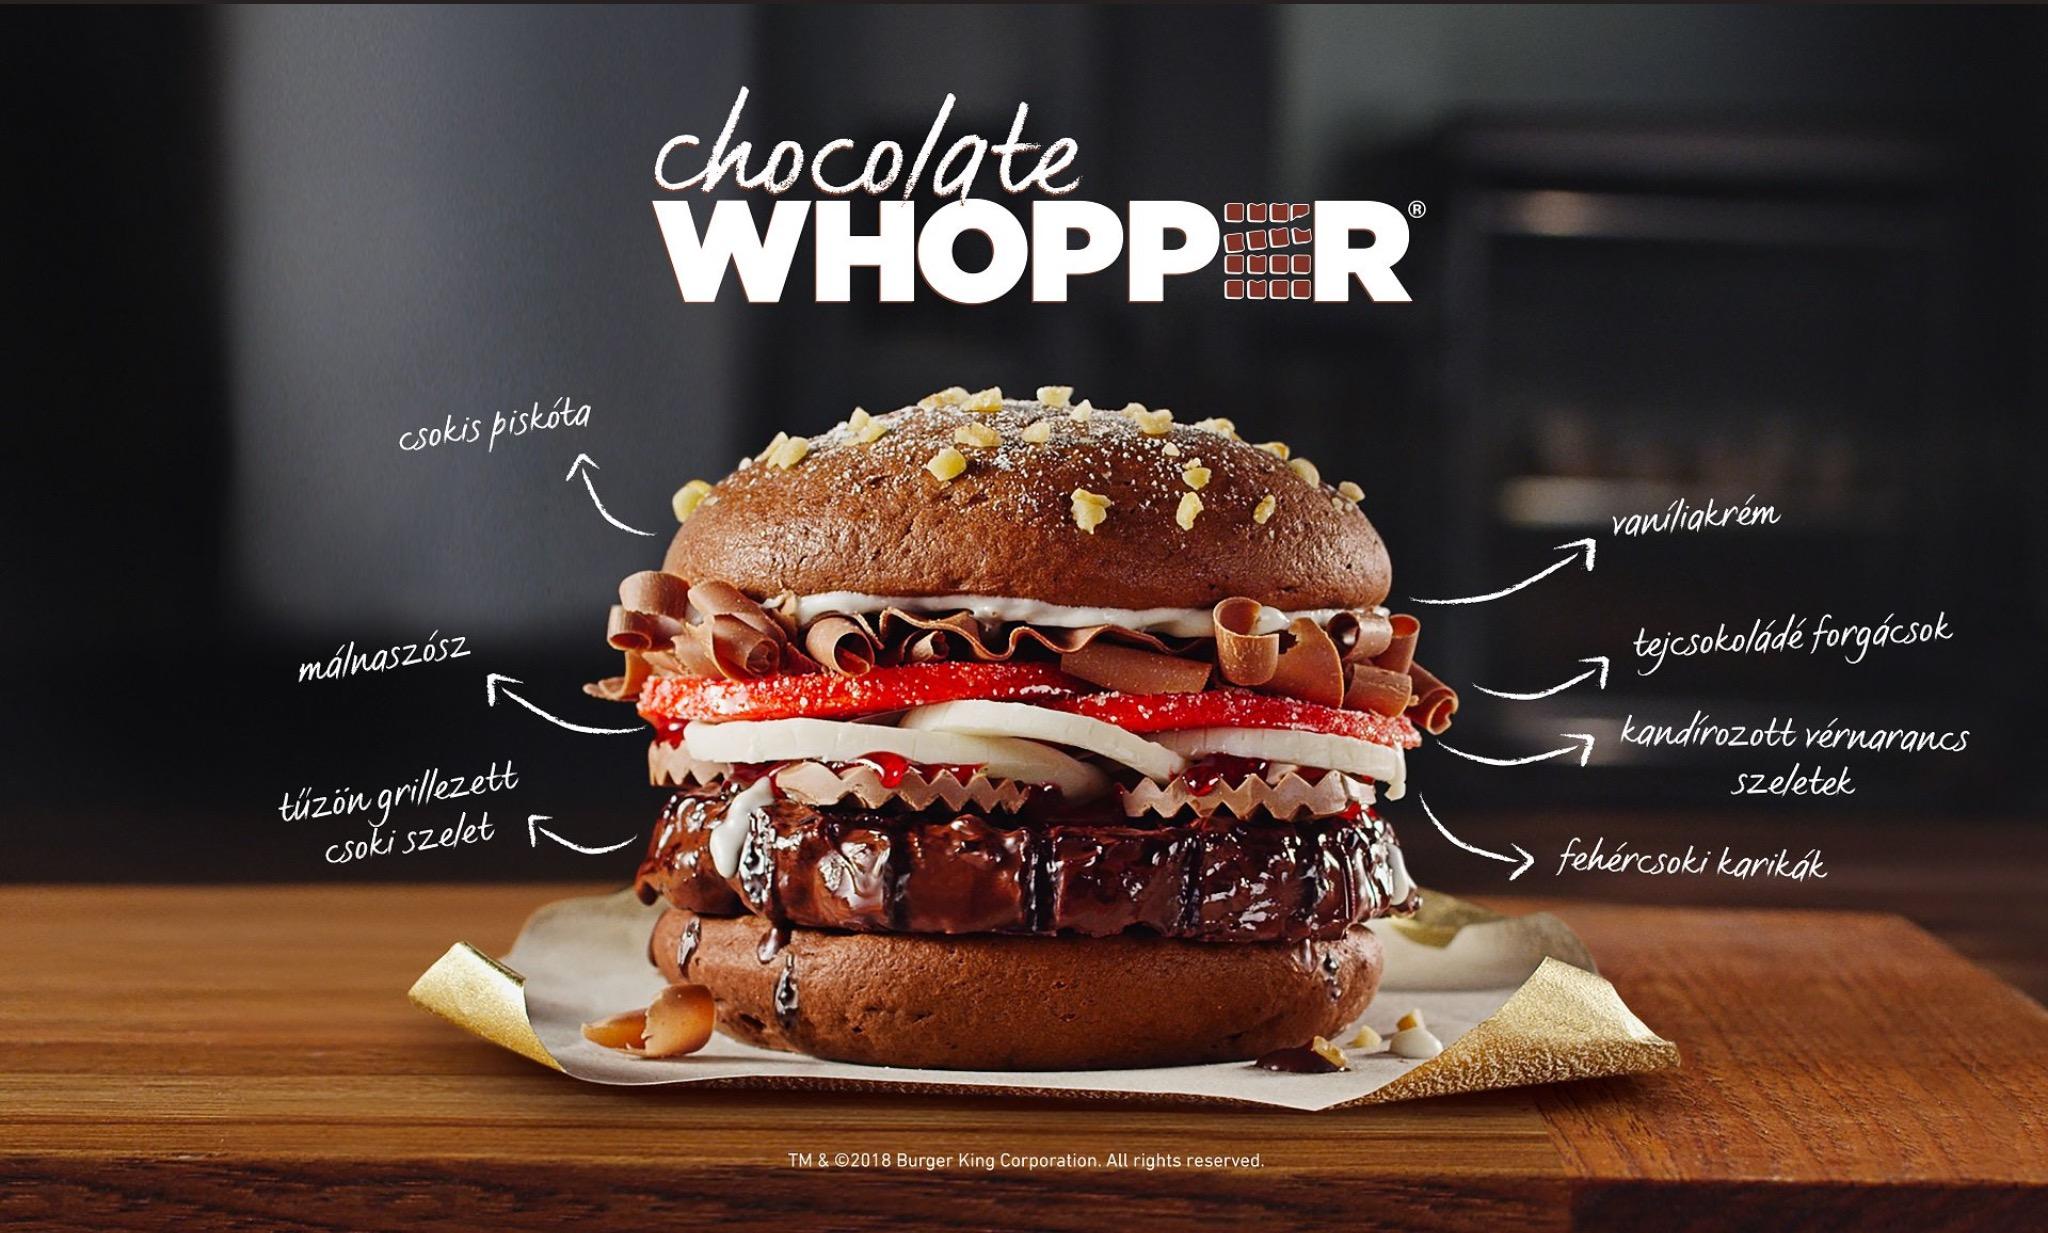 april-fool's-day-2018-of-burger-king